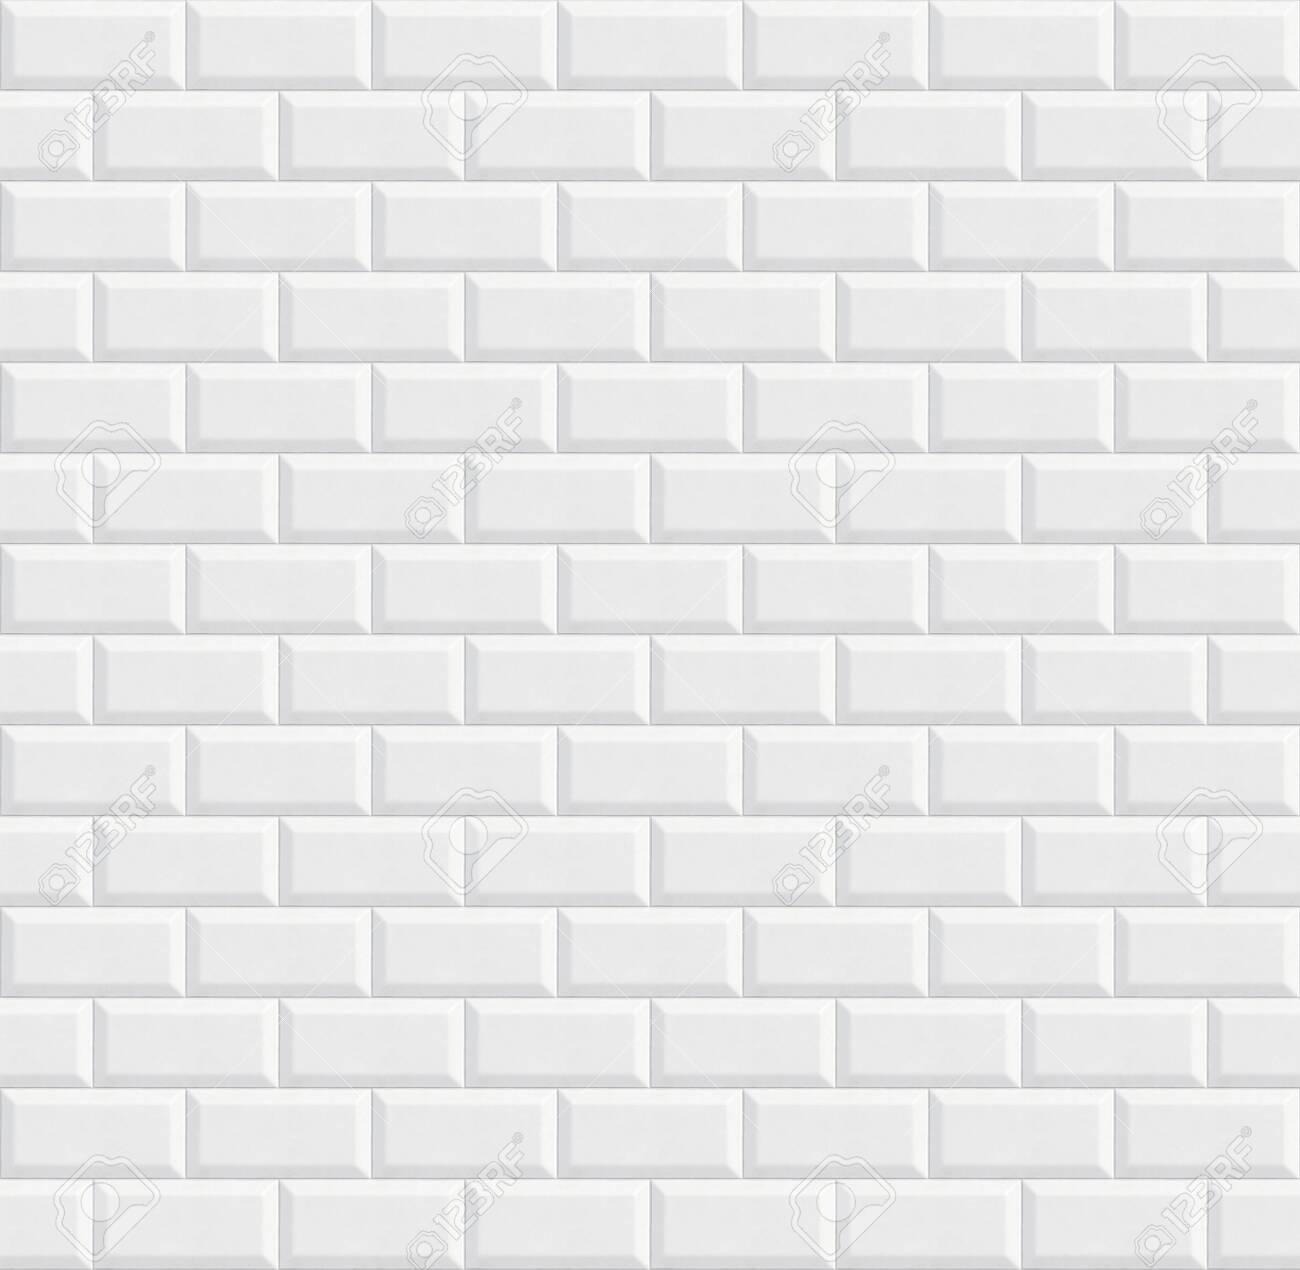 seamless ceramic tiles, white wall background texture - 131425596